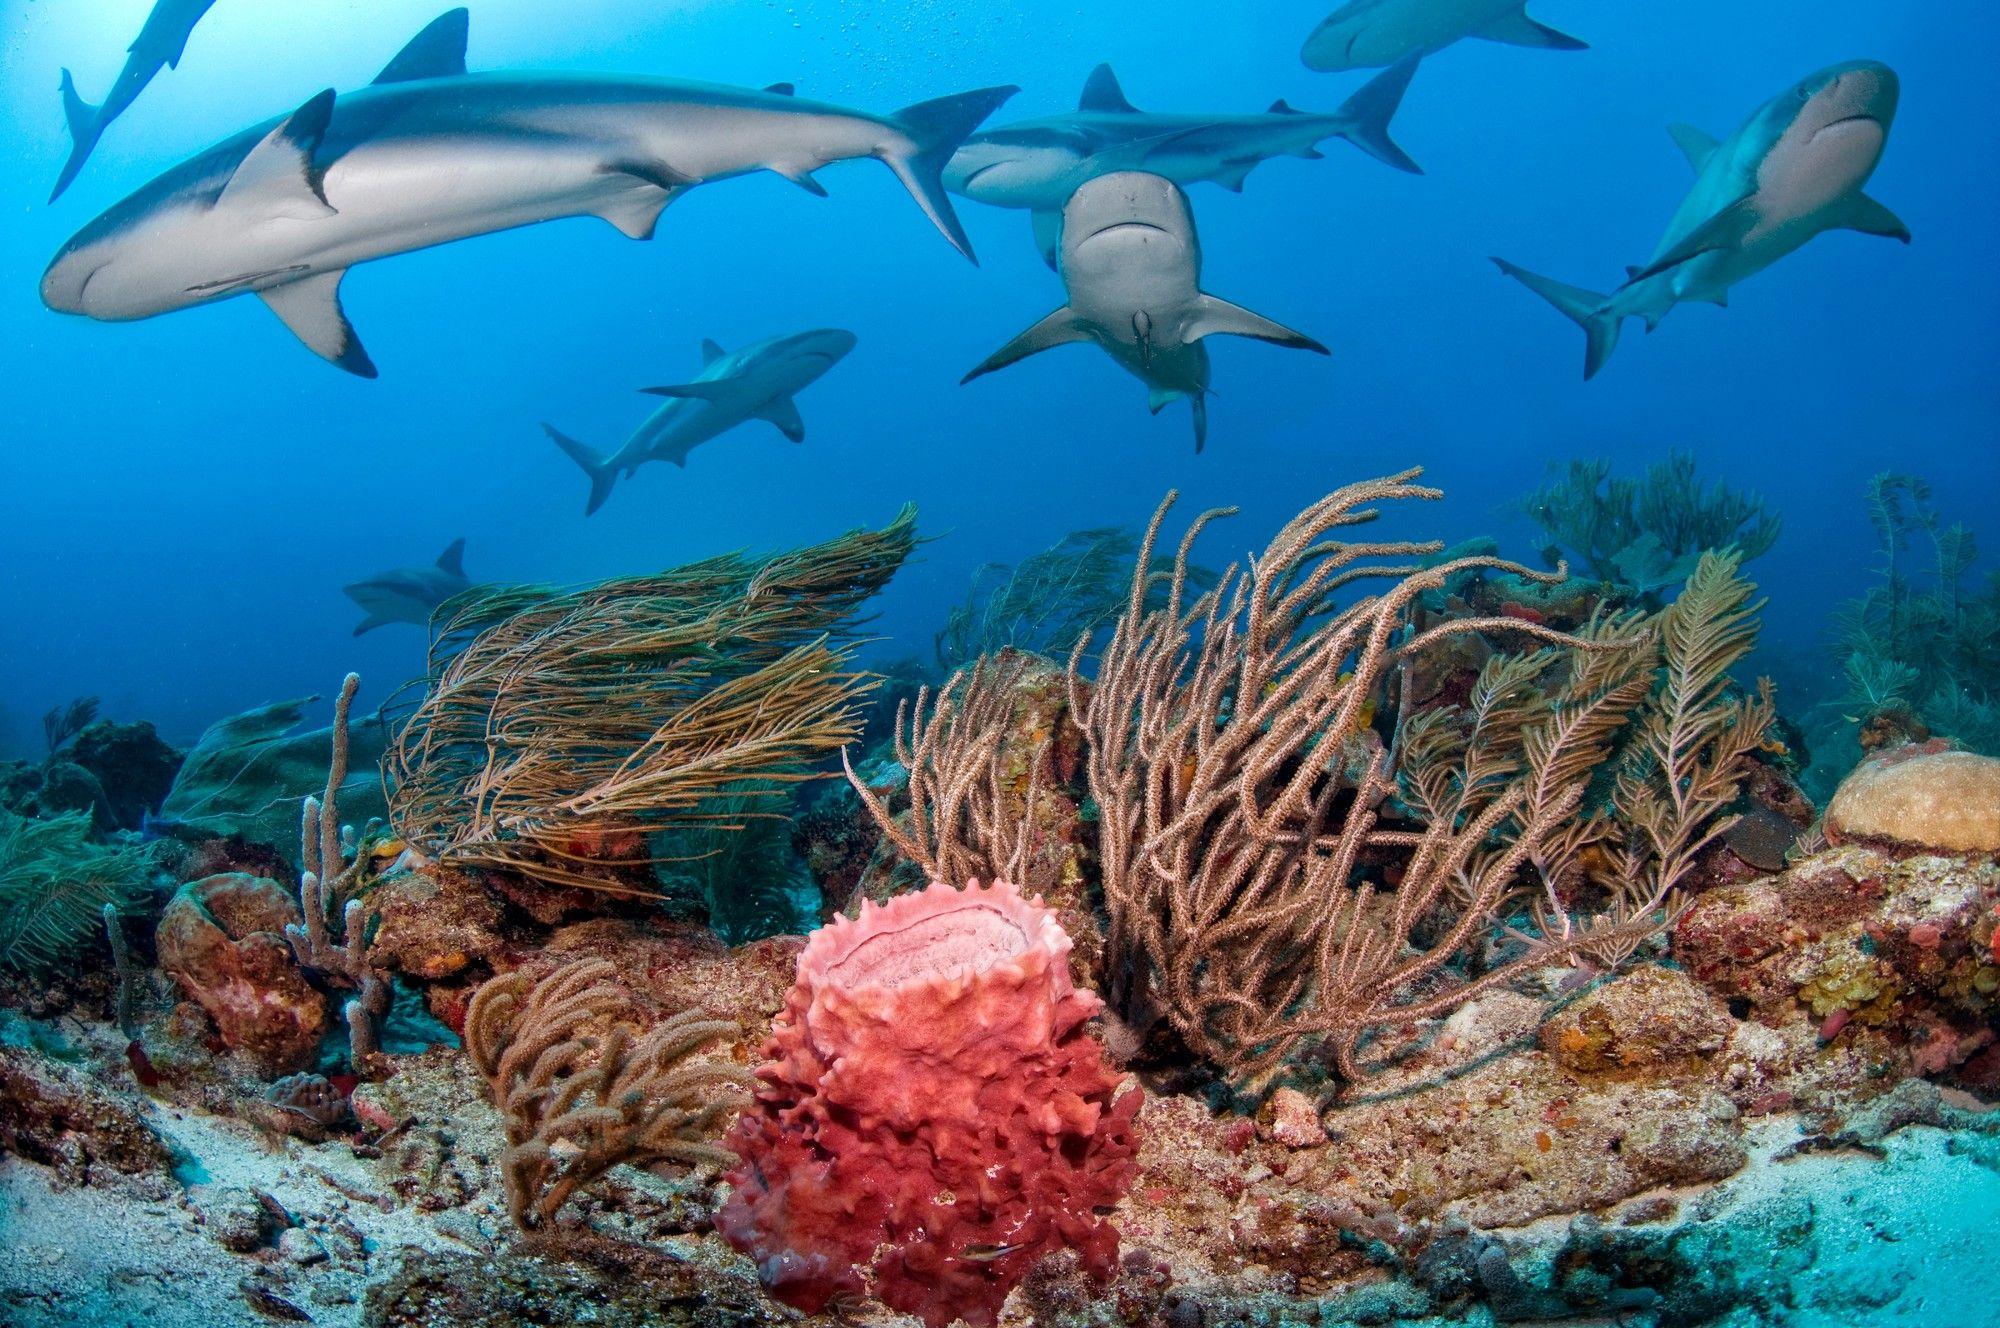 Caribbean Reef Sharks surrounding the coral reef Φοίνικες, Καραϊβική, Ζώα, Ζωή, Καρχαρίες, Φύση, Εικόνες